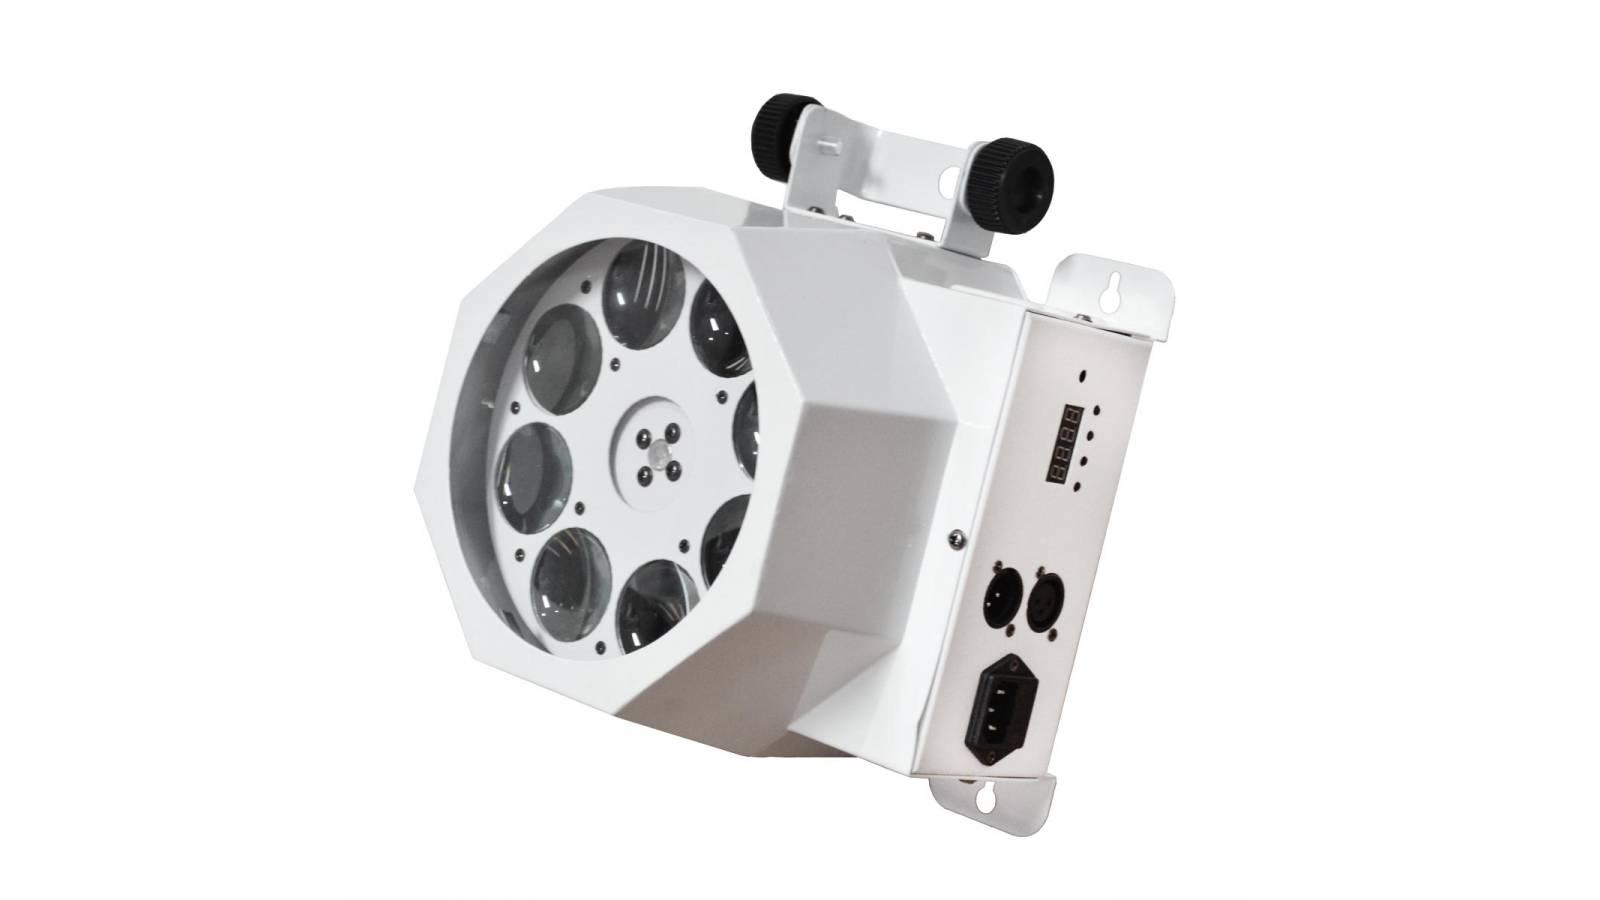 Efecto LED Audiorritmico 8 Bocas Gobo Attack RGBW GCM Pro!